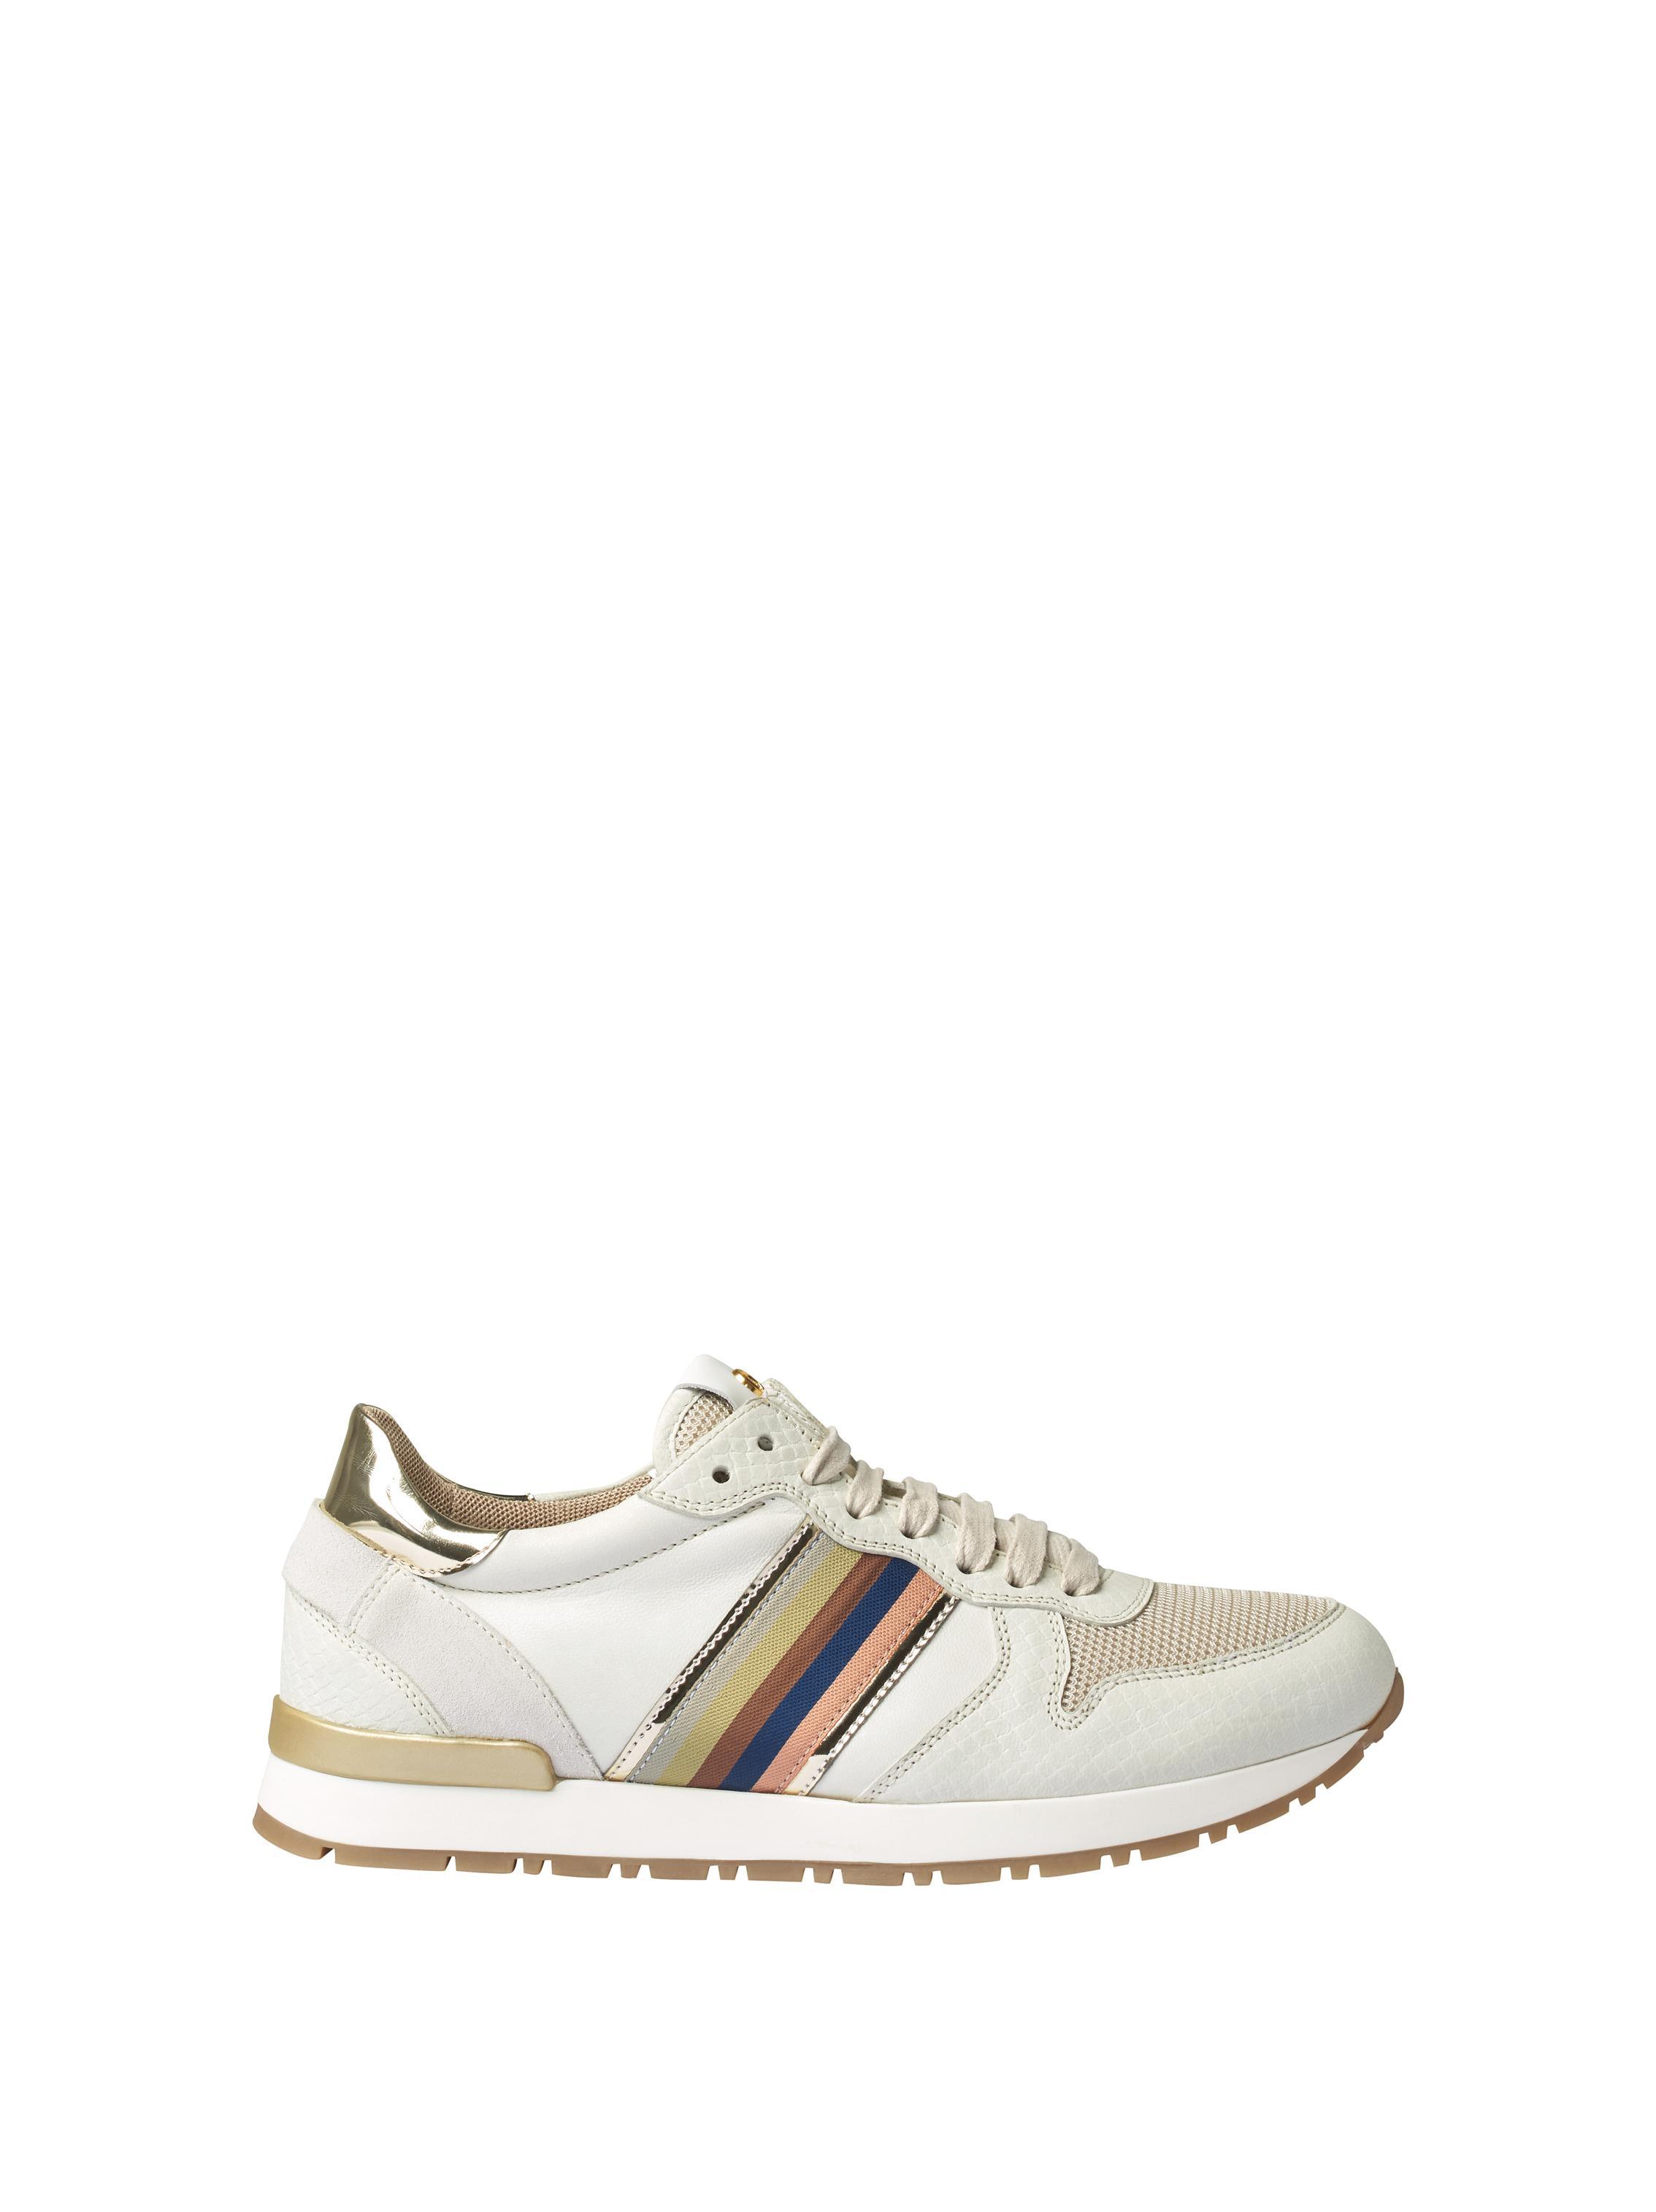 Sneakers Lisboa Lady 7D Bogner white Bogner aQfF4Q